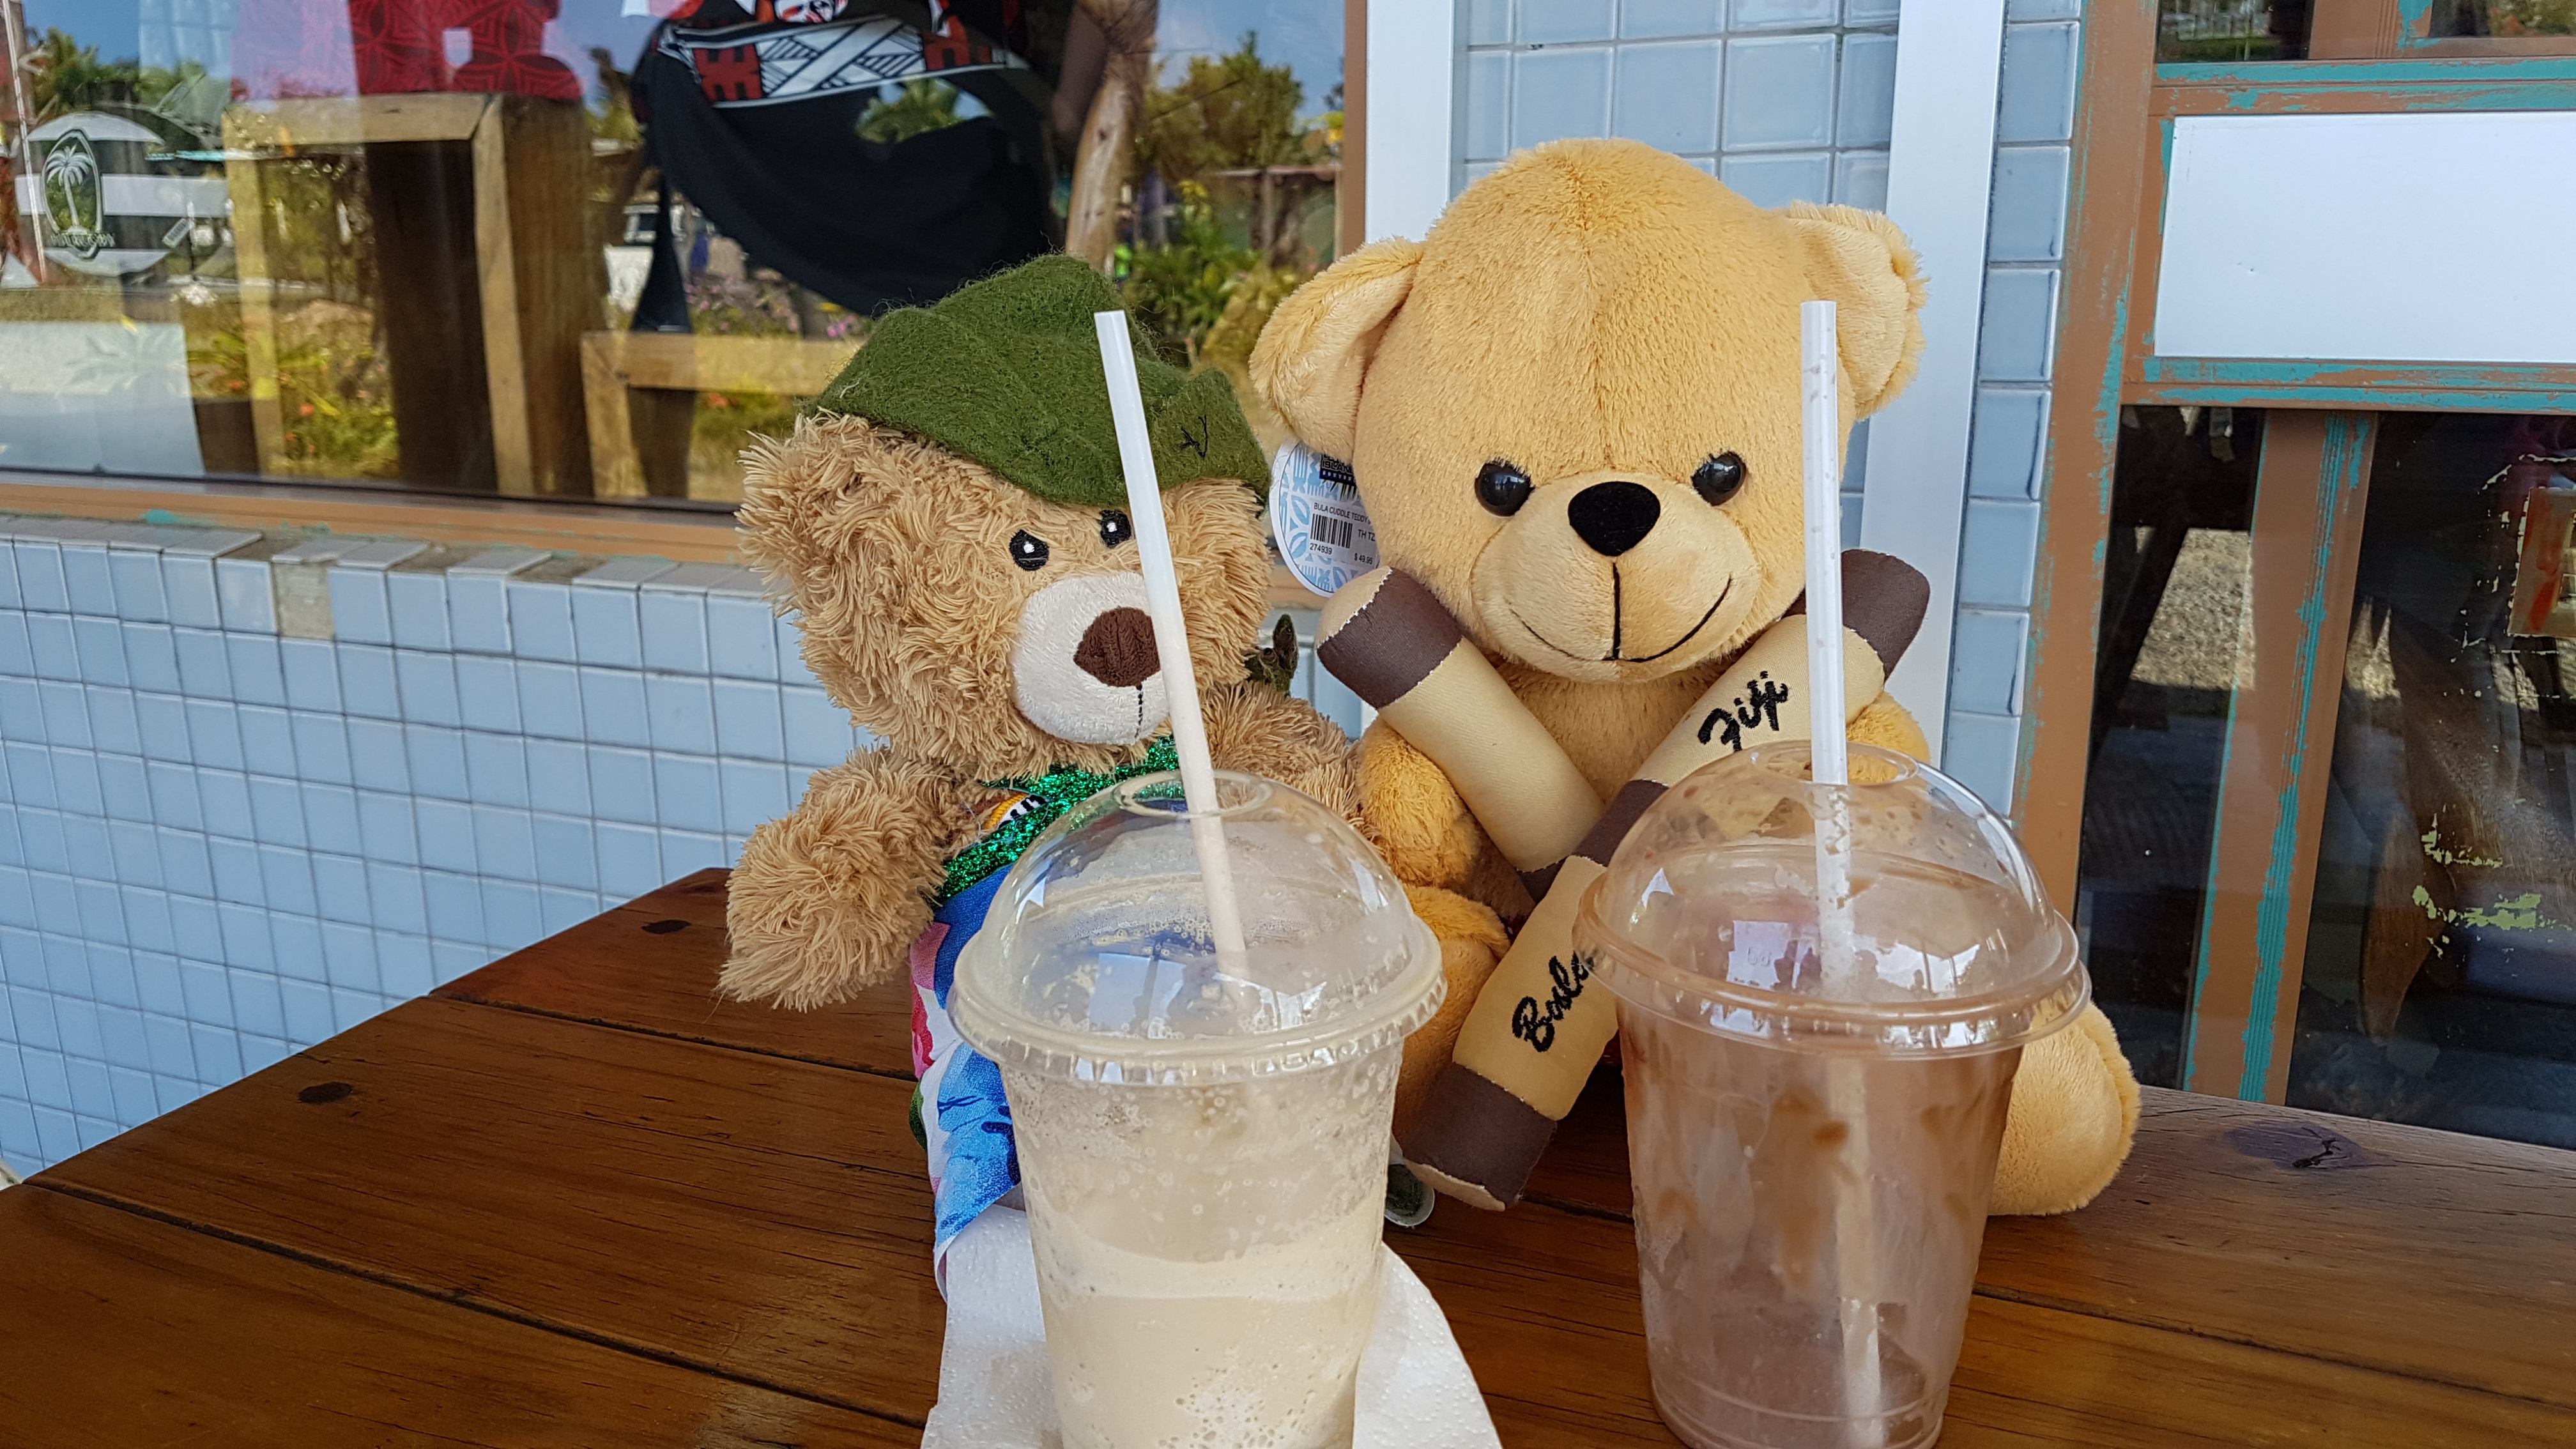 96 Bearnice and Bula Bear